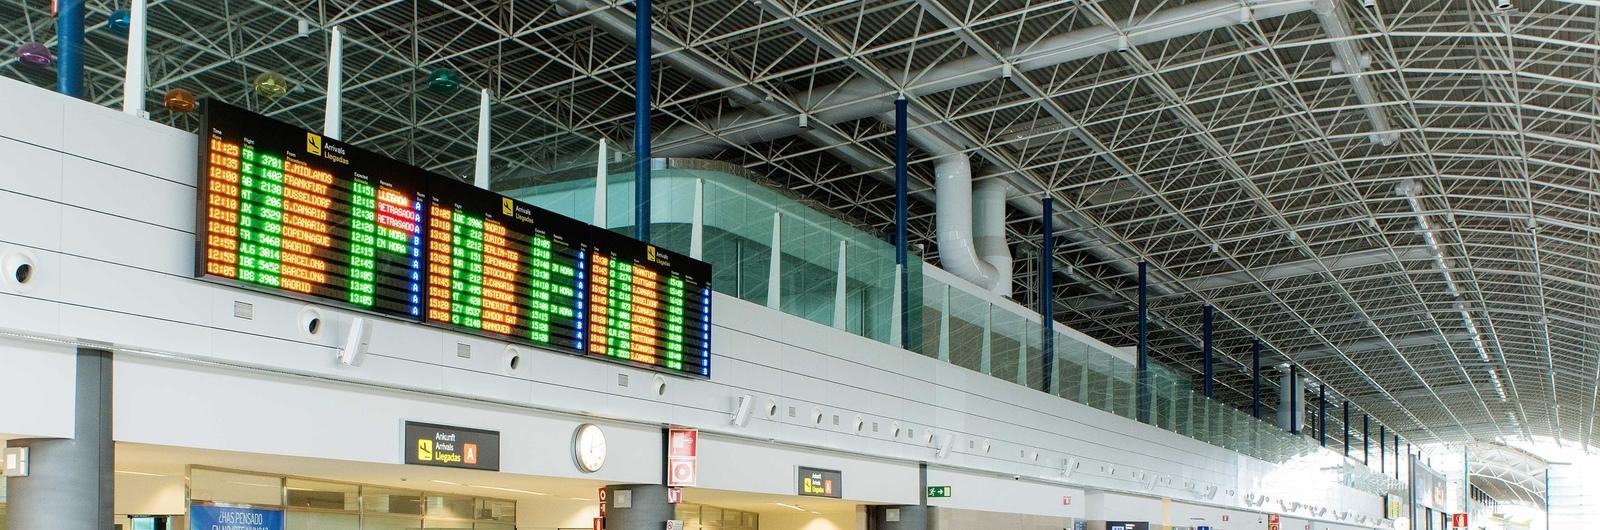 fuerteventura airport header